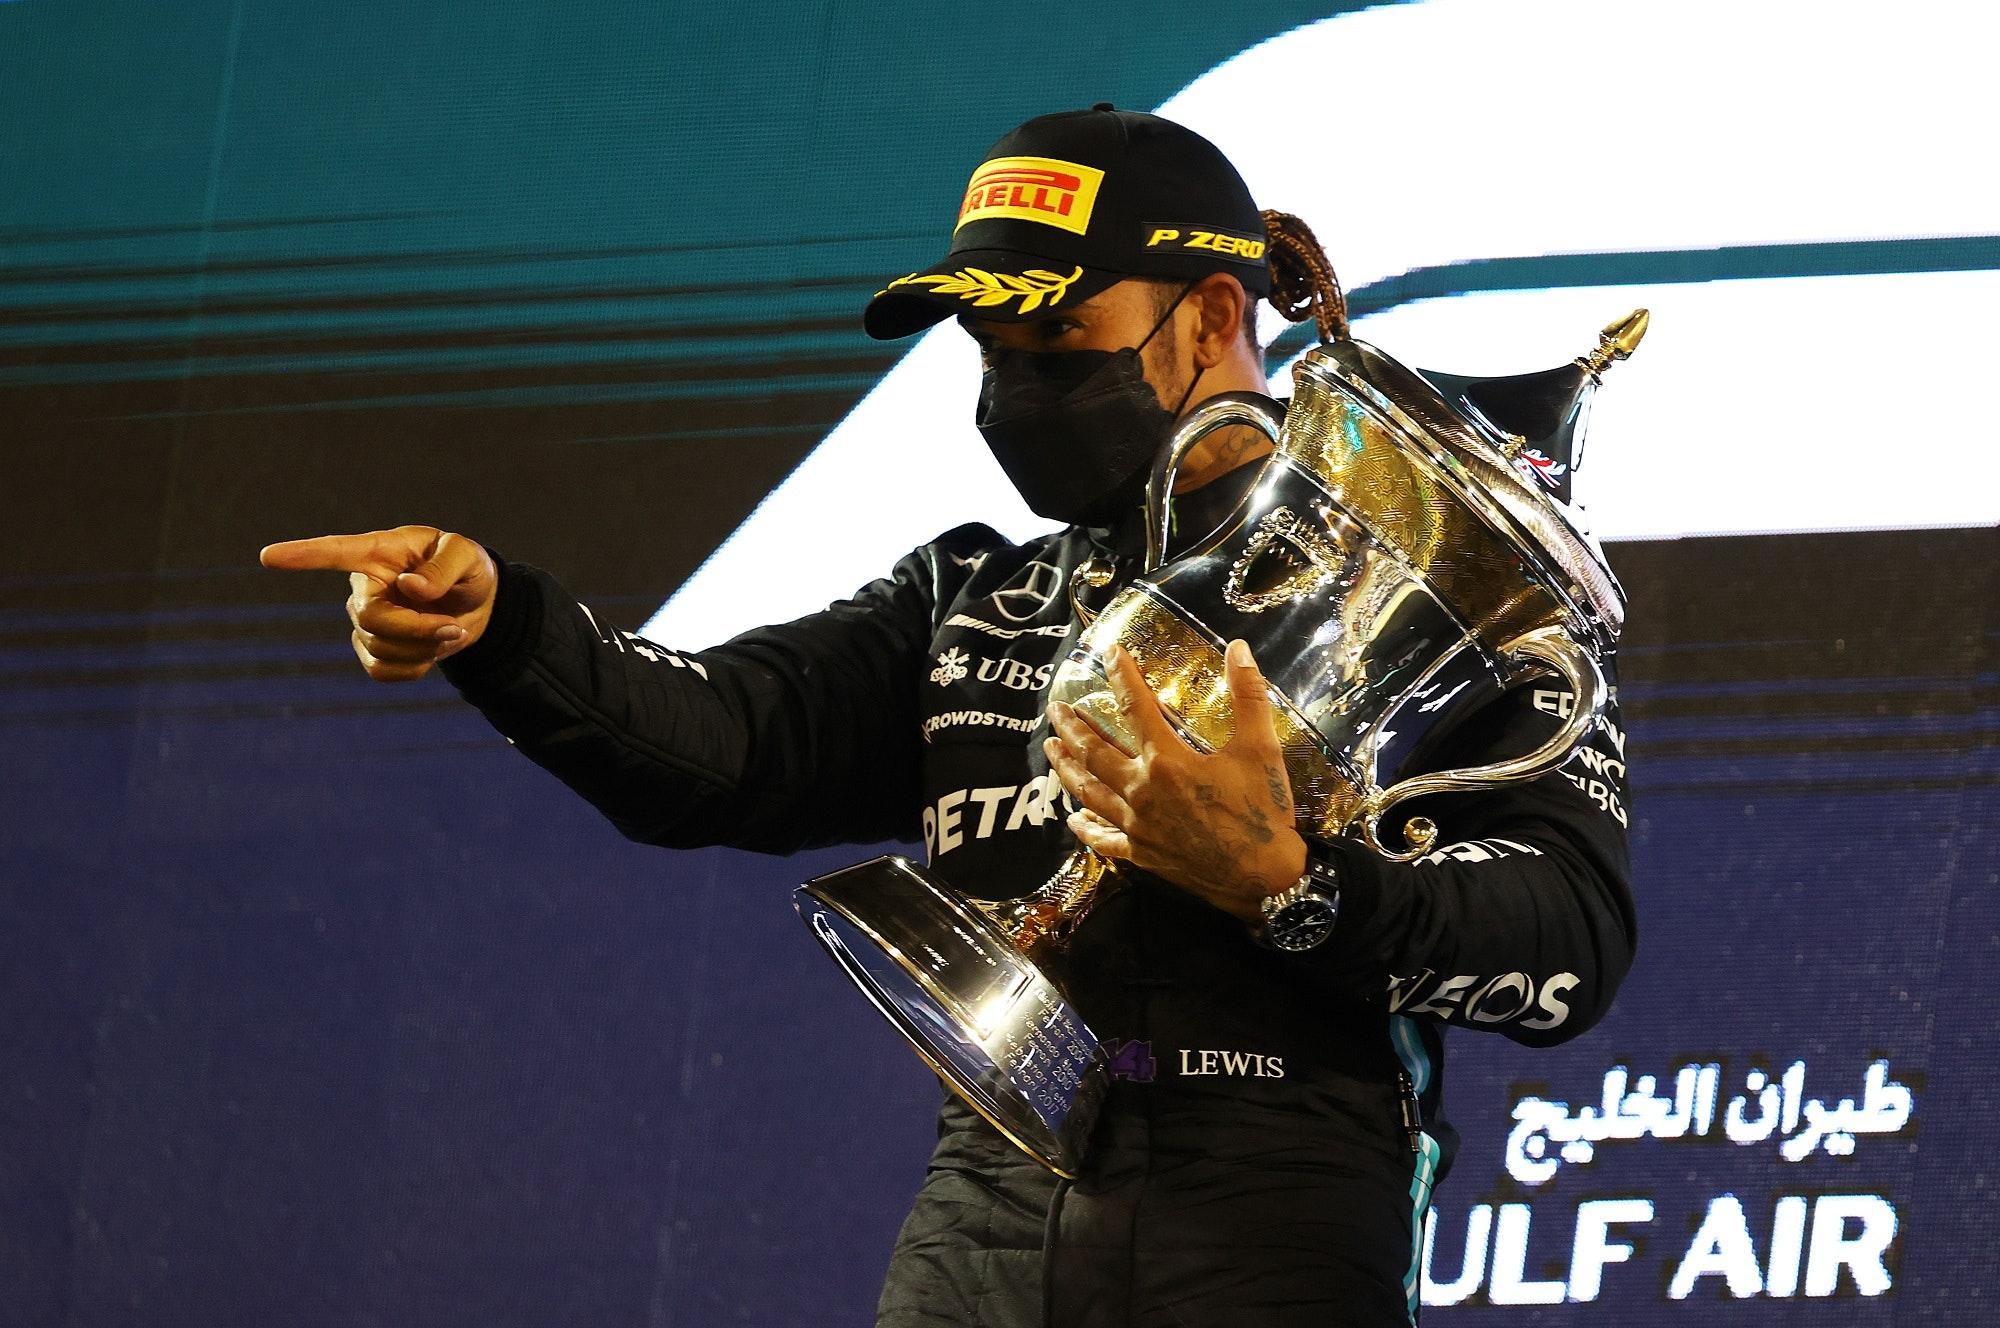 F1 Grand Prix of Bahrain: Lewis Hamilton